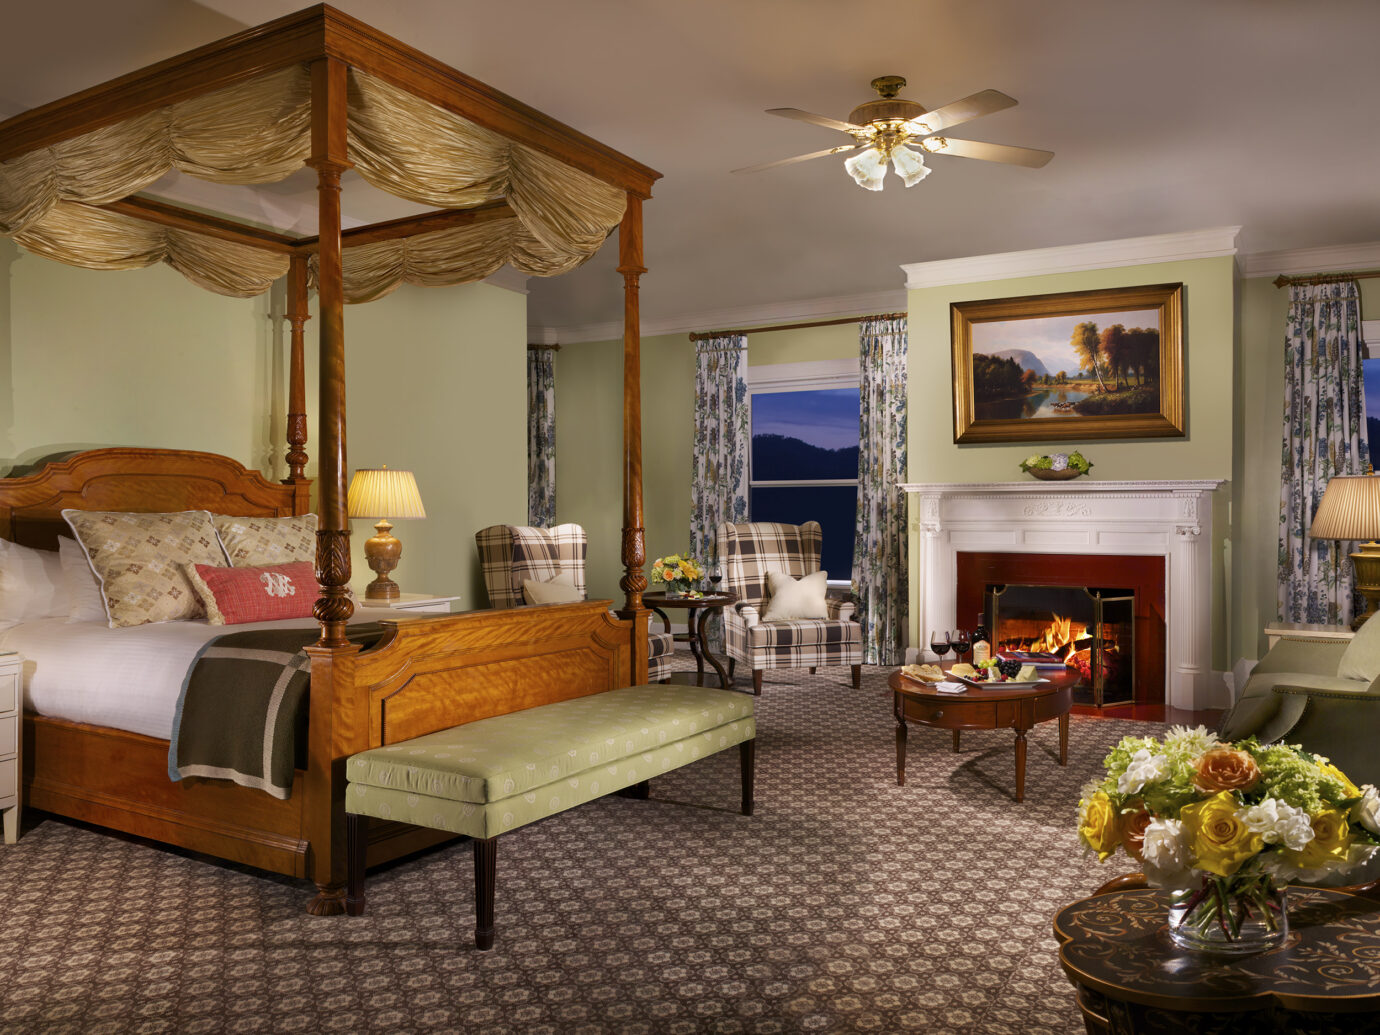 Bedroom at Omni Mount Washington Resort, Bretton Woods, NH